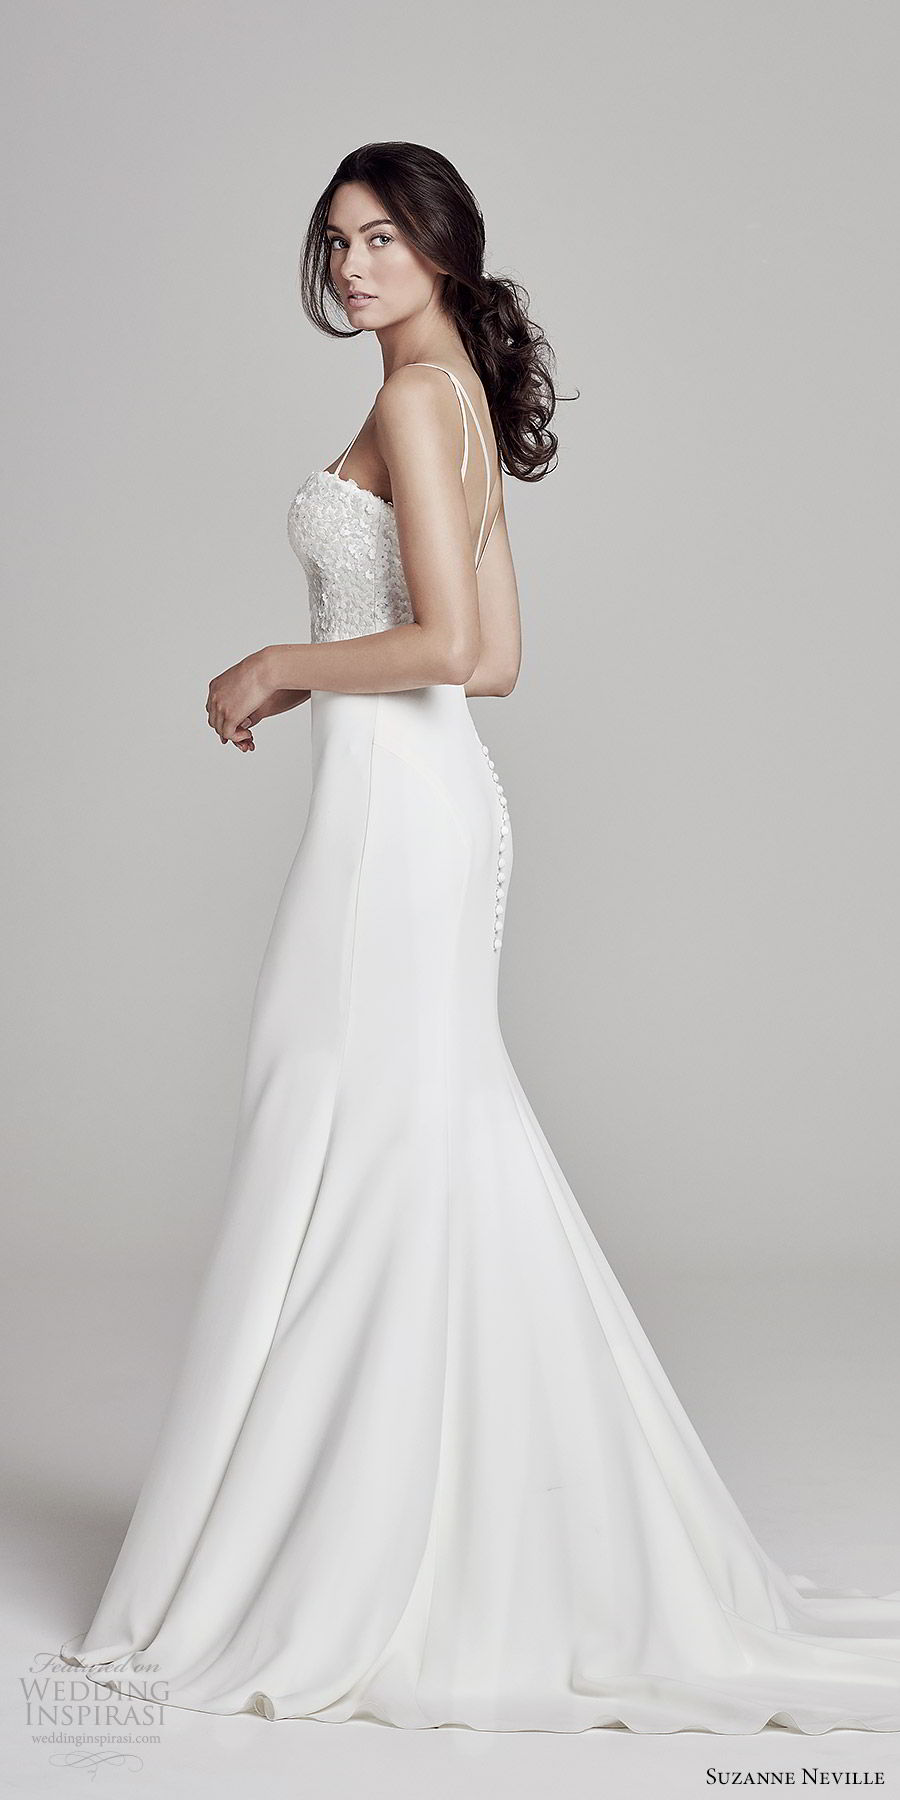 suzanne neville bridal 2019 sleeveless thin straps sweetheart embellished bodice sheath wedding dress (bronte) chapel train elegant chic bv